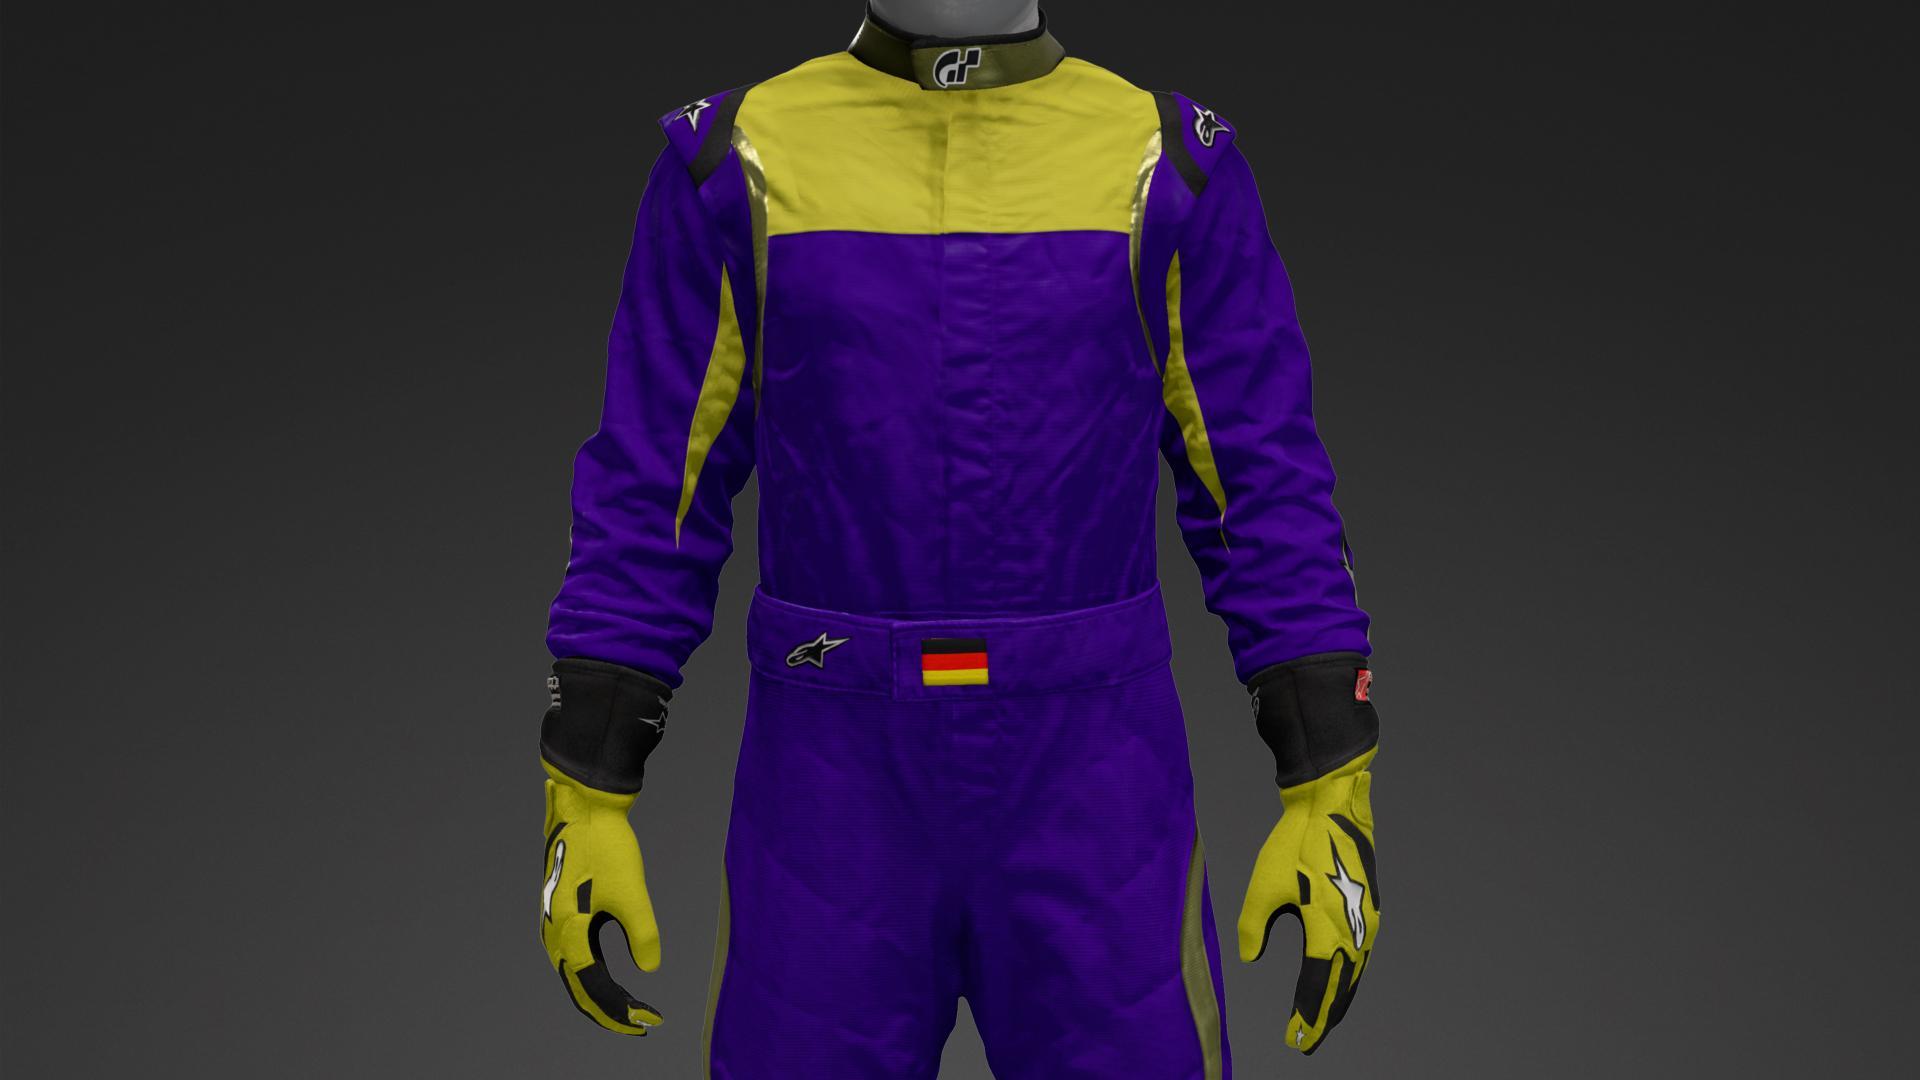 Combinaison Karting Sport course Costume Suit Karting Combo Noir // Blanc